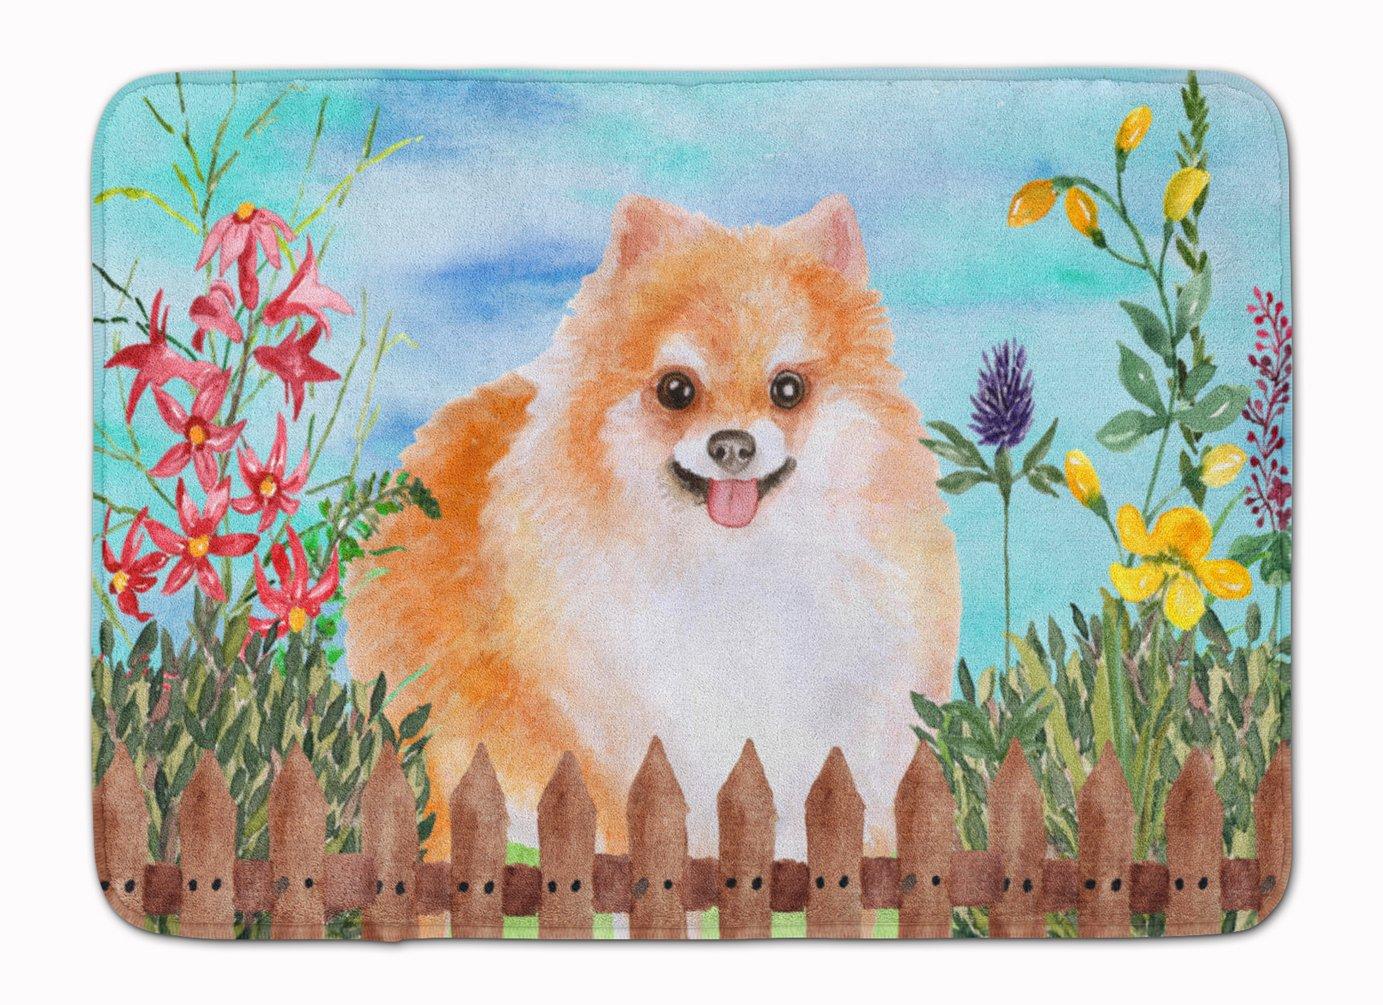 Carolines Treasures Pomeranian #2 Spring Floor Mat 19 x 27 Multicolor